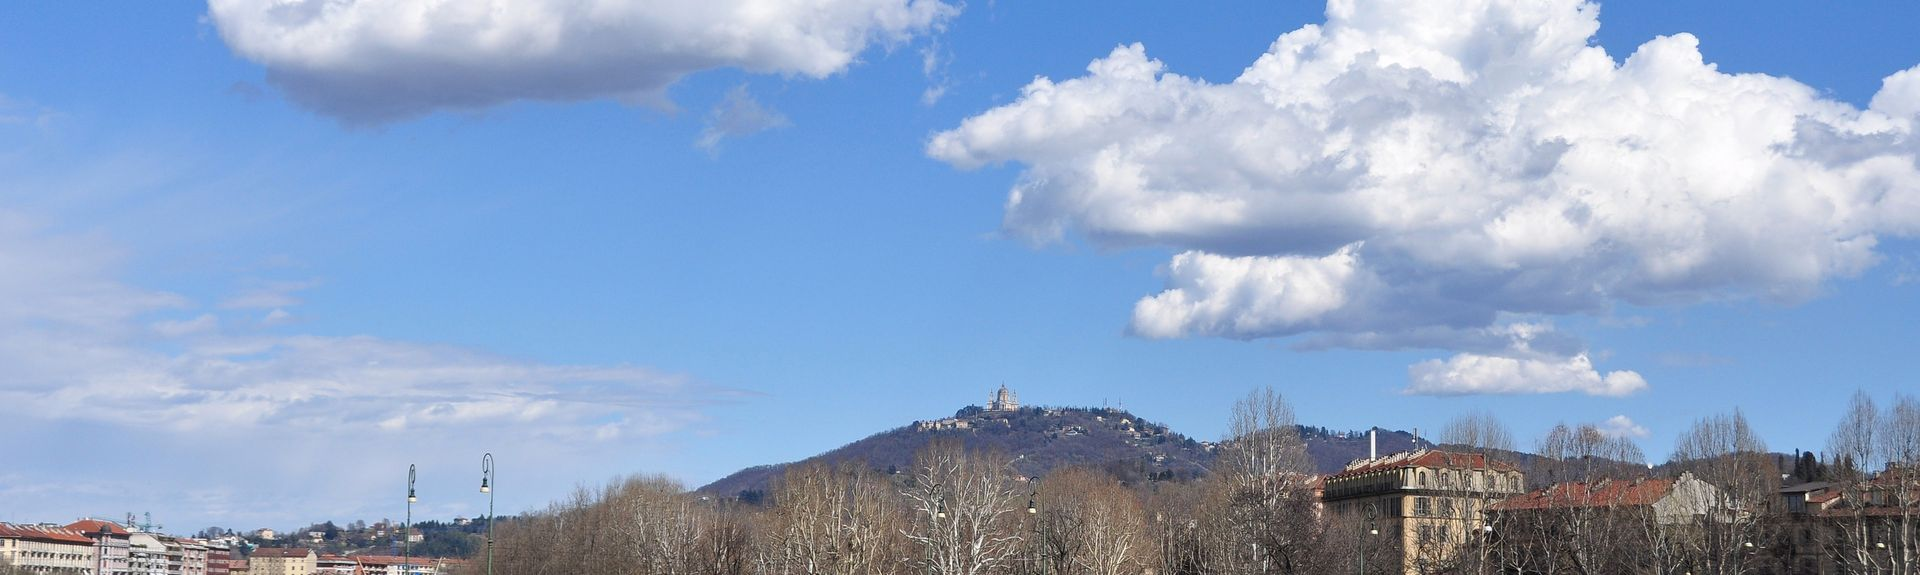 Campidoglio, Turin, Piémont, Italie